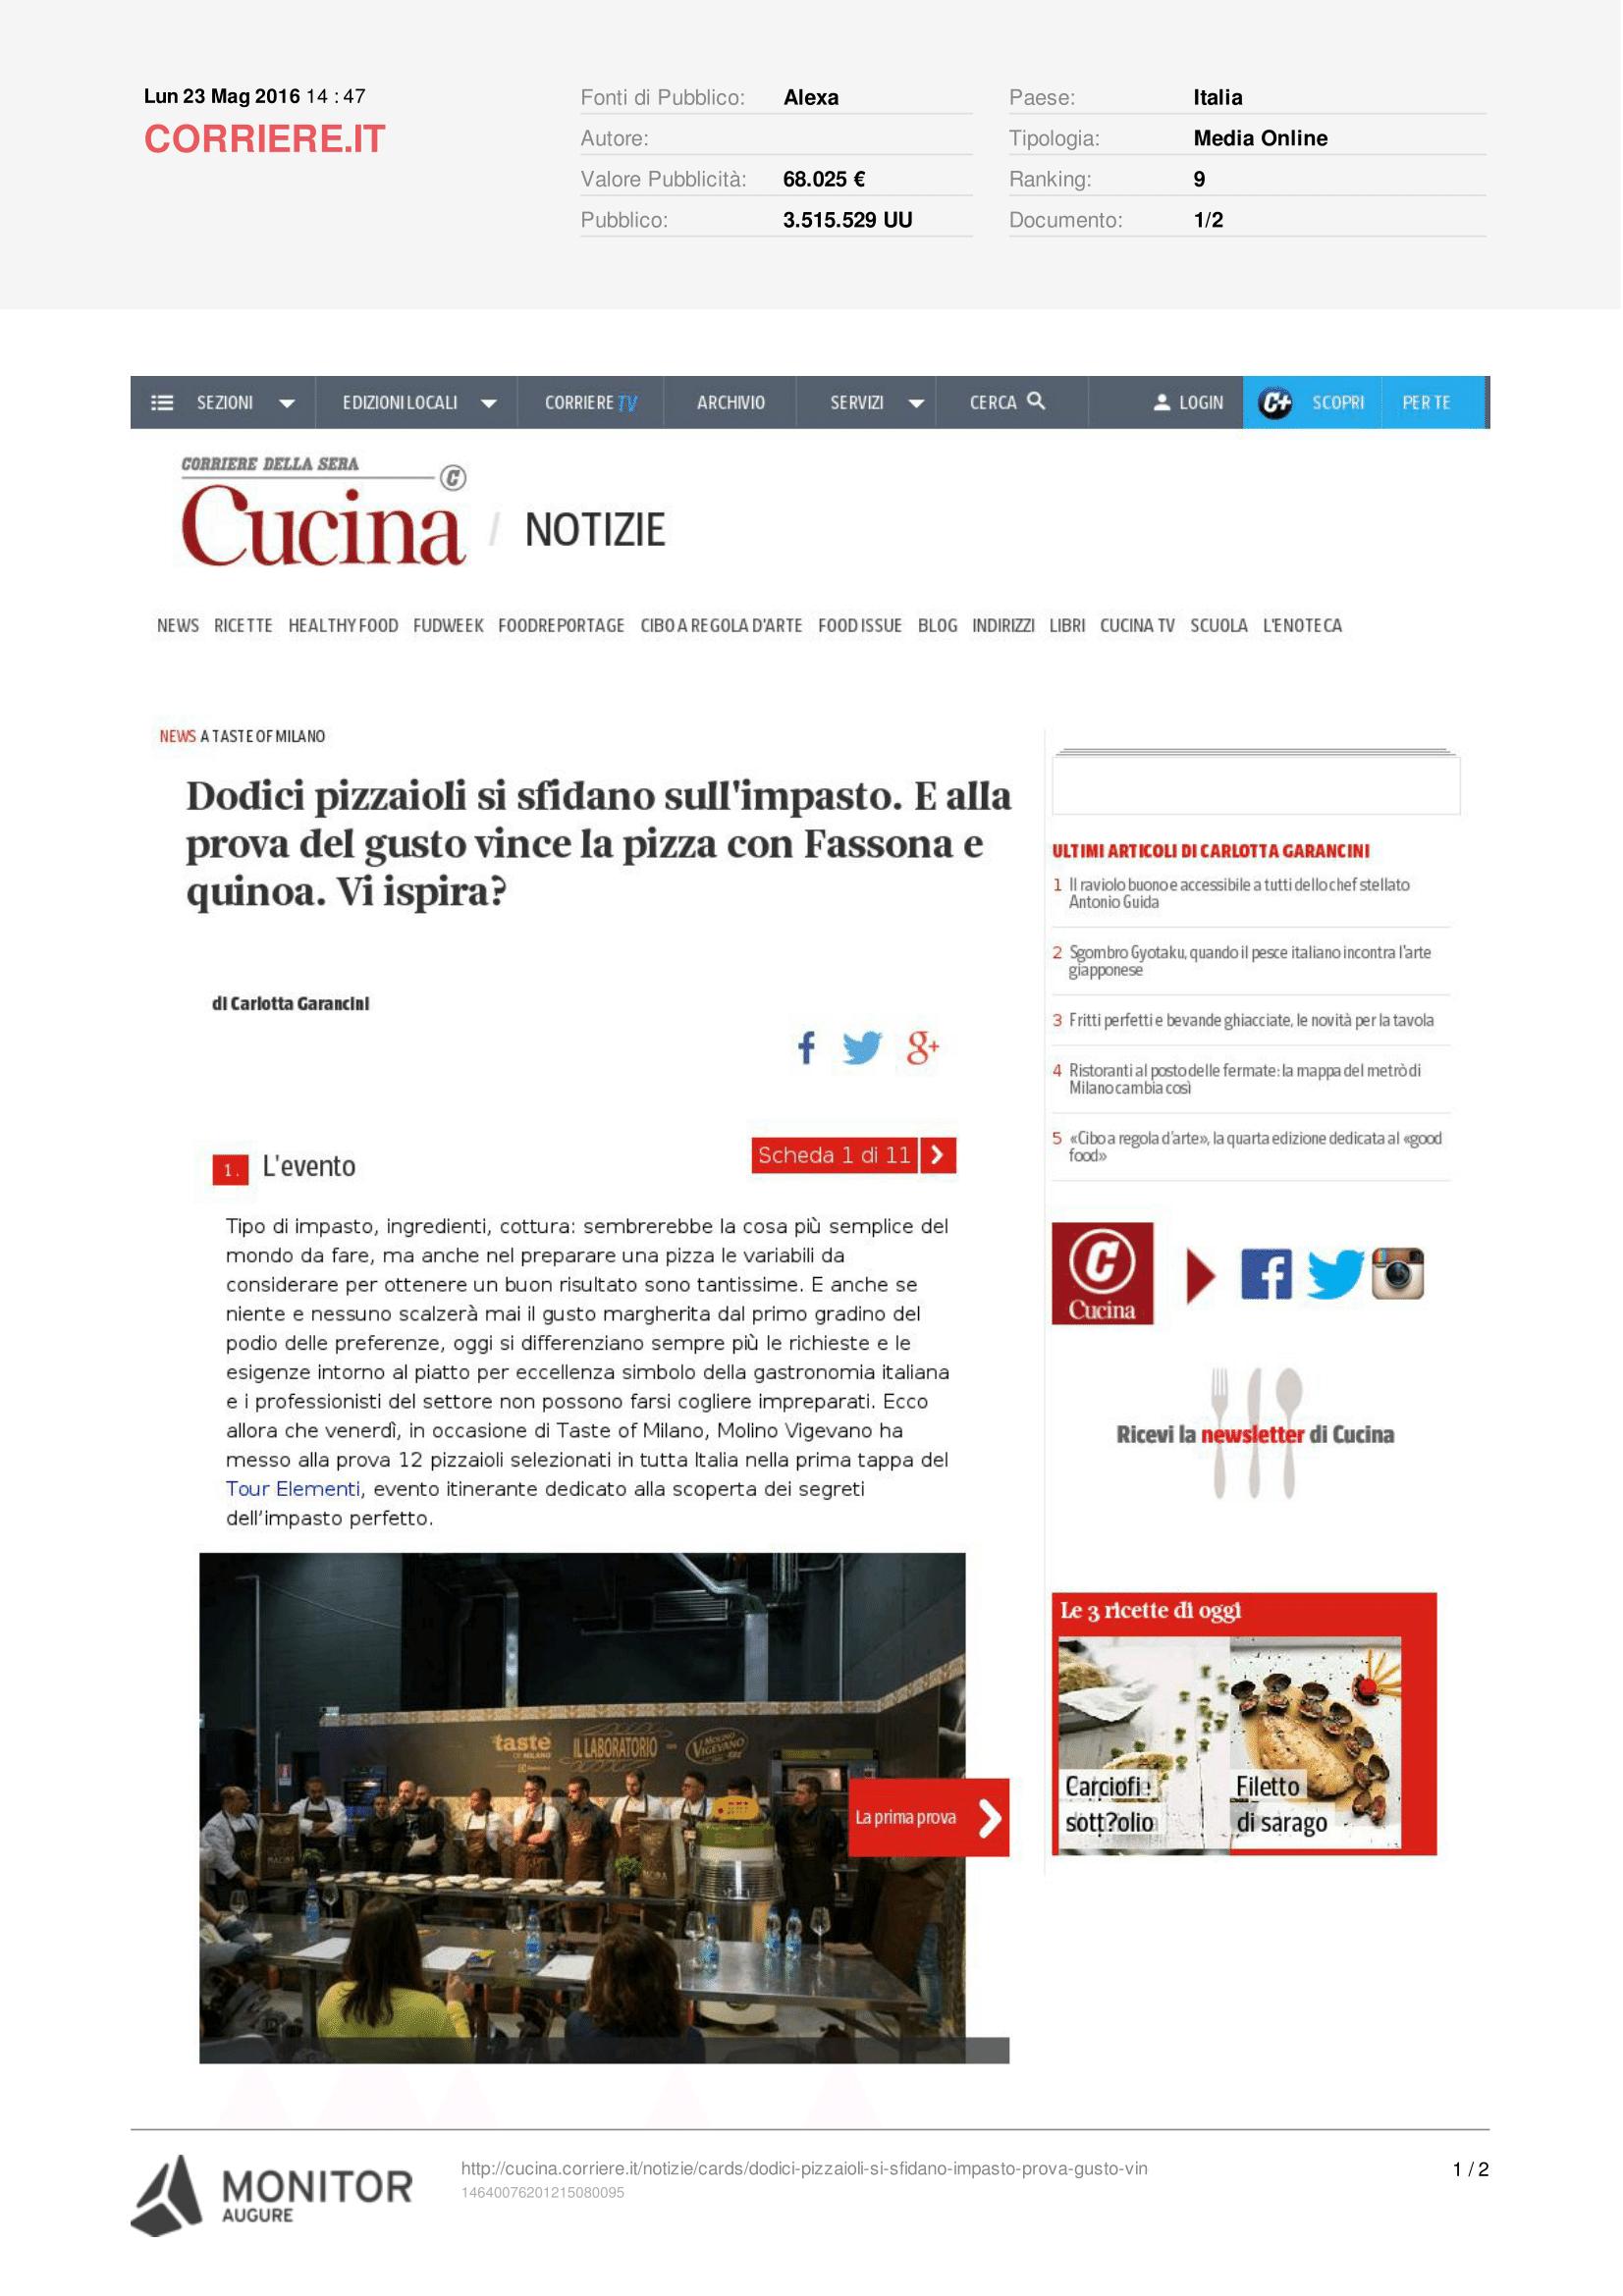 23.05.16_cucina.corriere.it-1